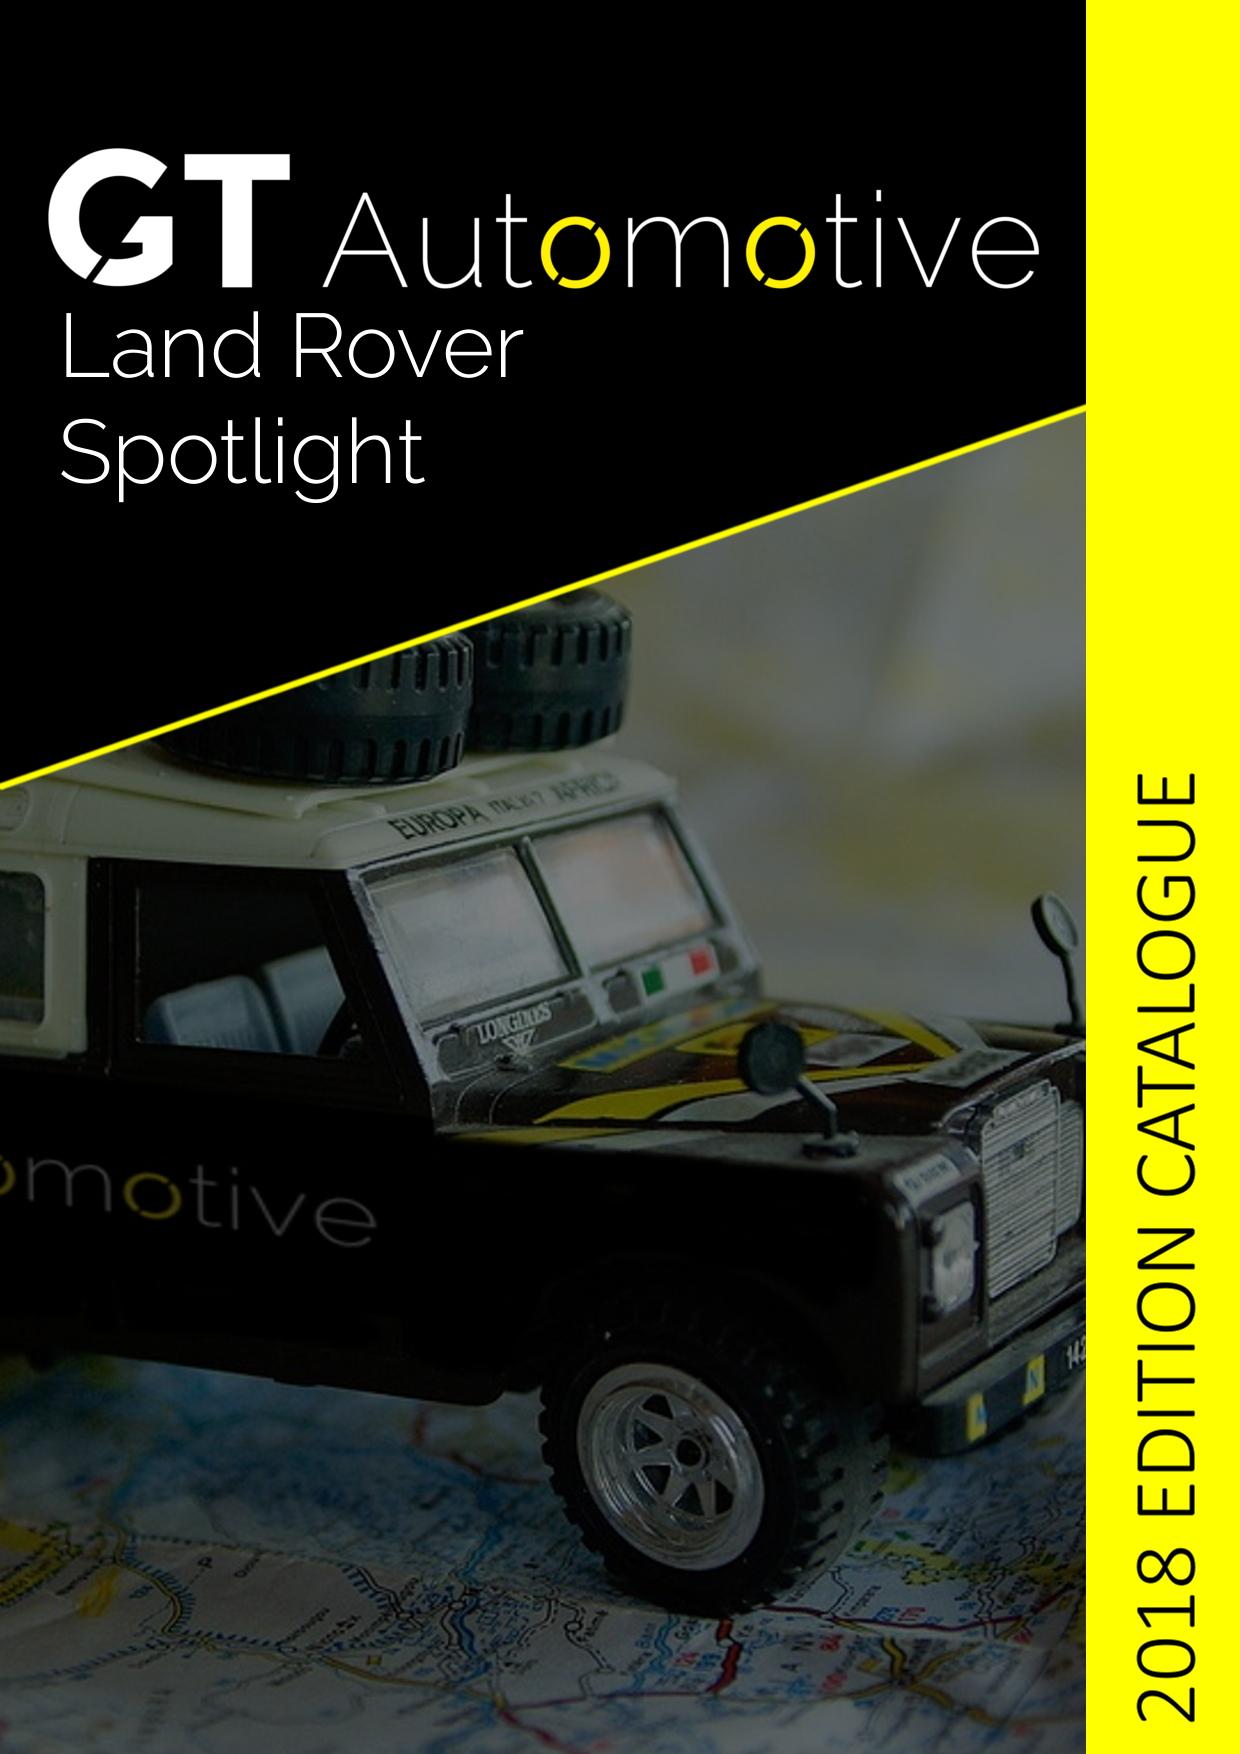 gt automotive land rover spotlight catalogue